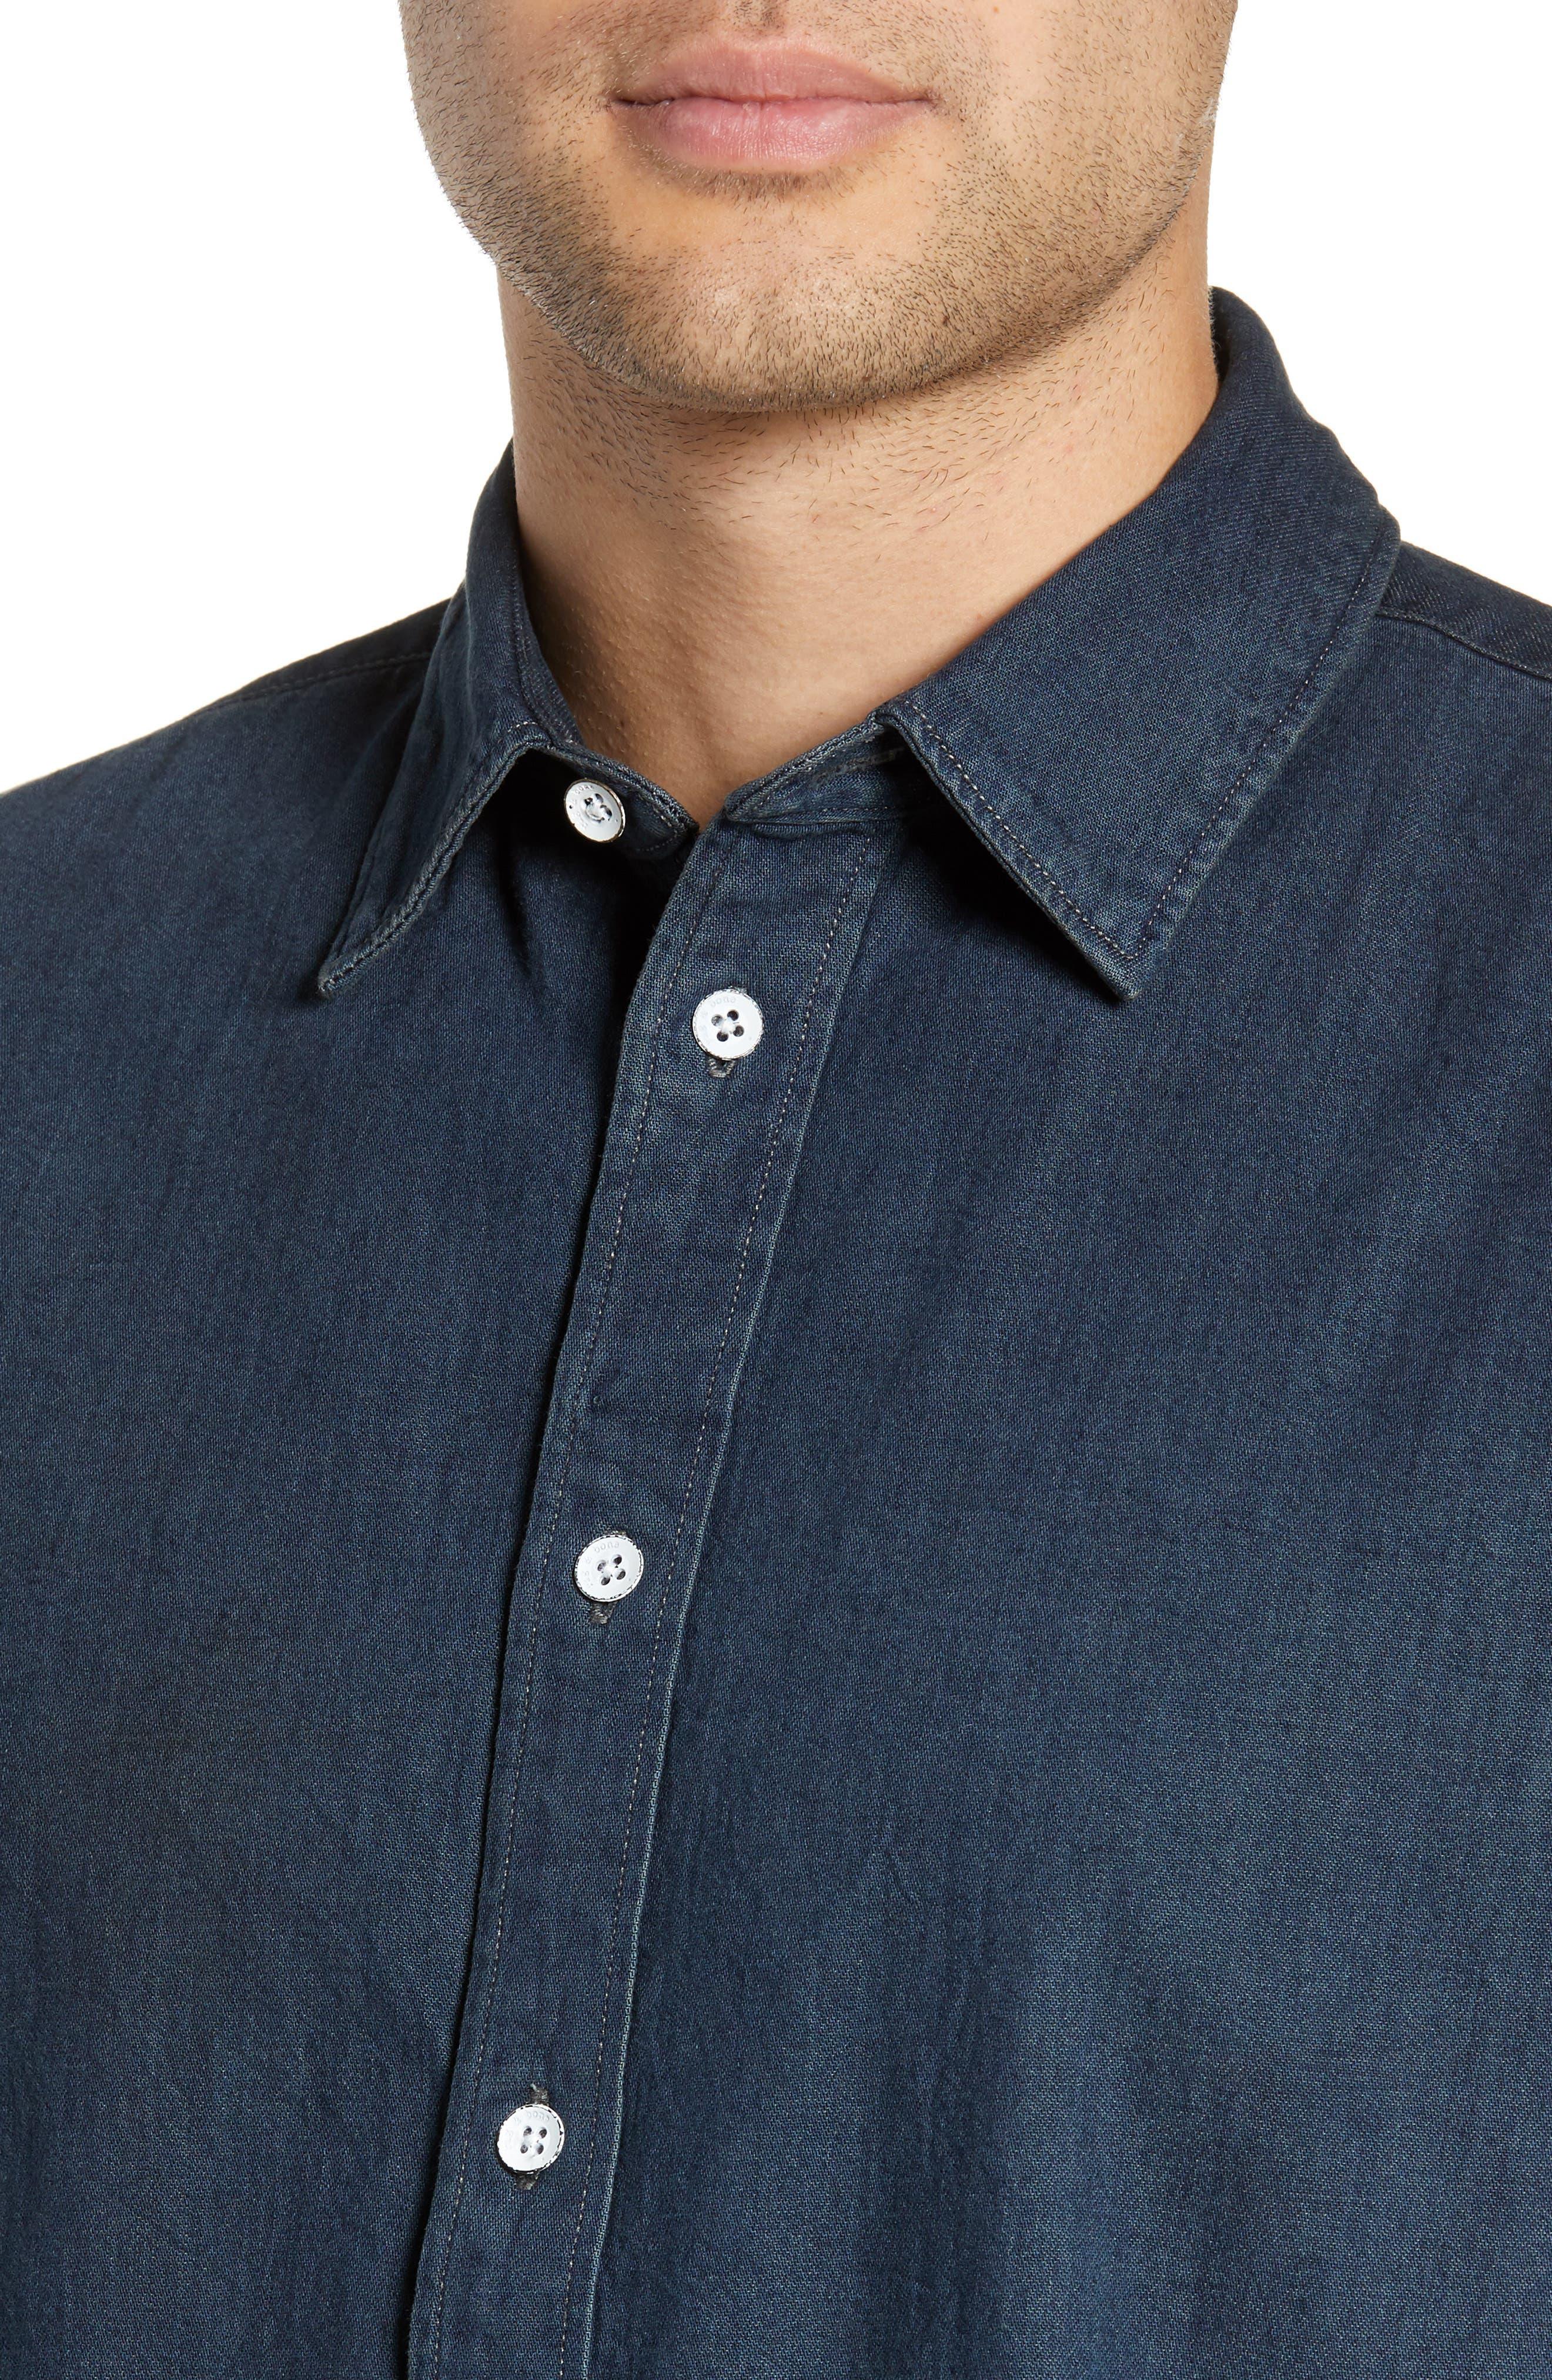 RAG & BONE,                             Fit 3 Denim Sport Shirt,                             Alternate thumbnail 2, color,                             STONE BLUE